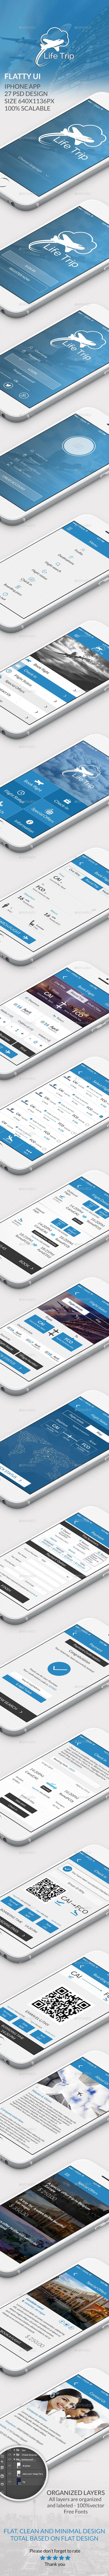 Life Trip - User Interfaces Web Elements